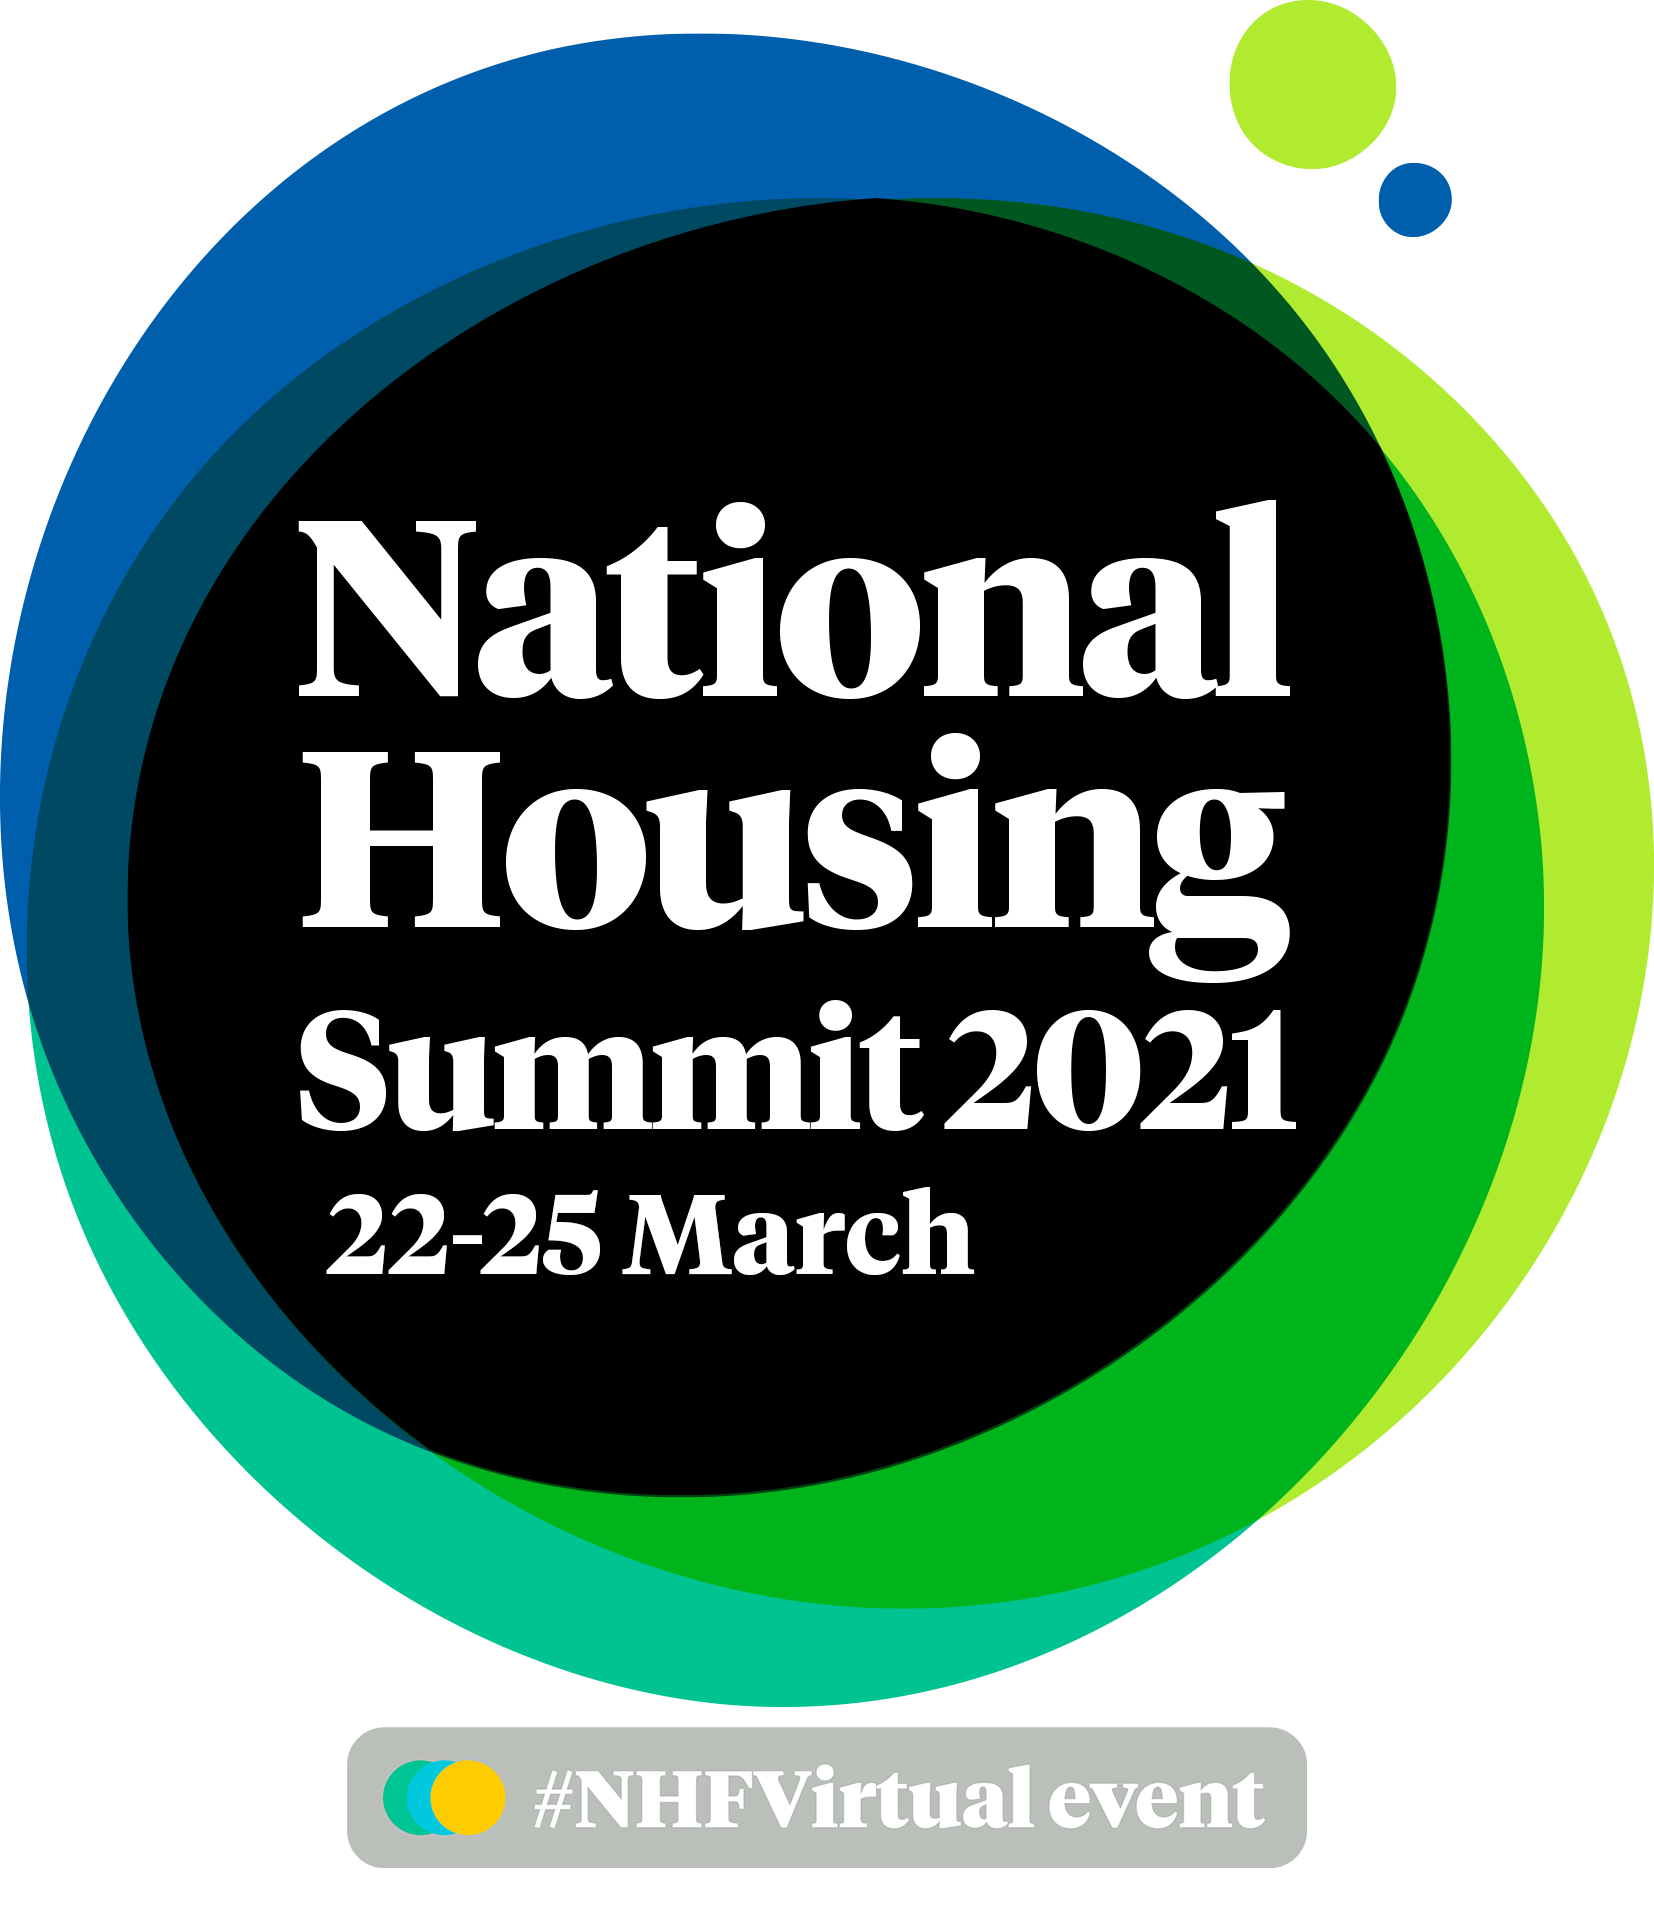 National Housing Summit